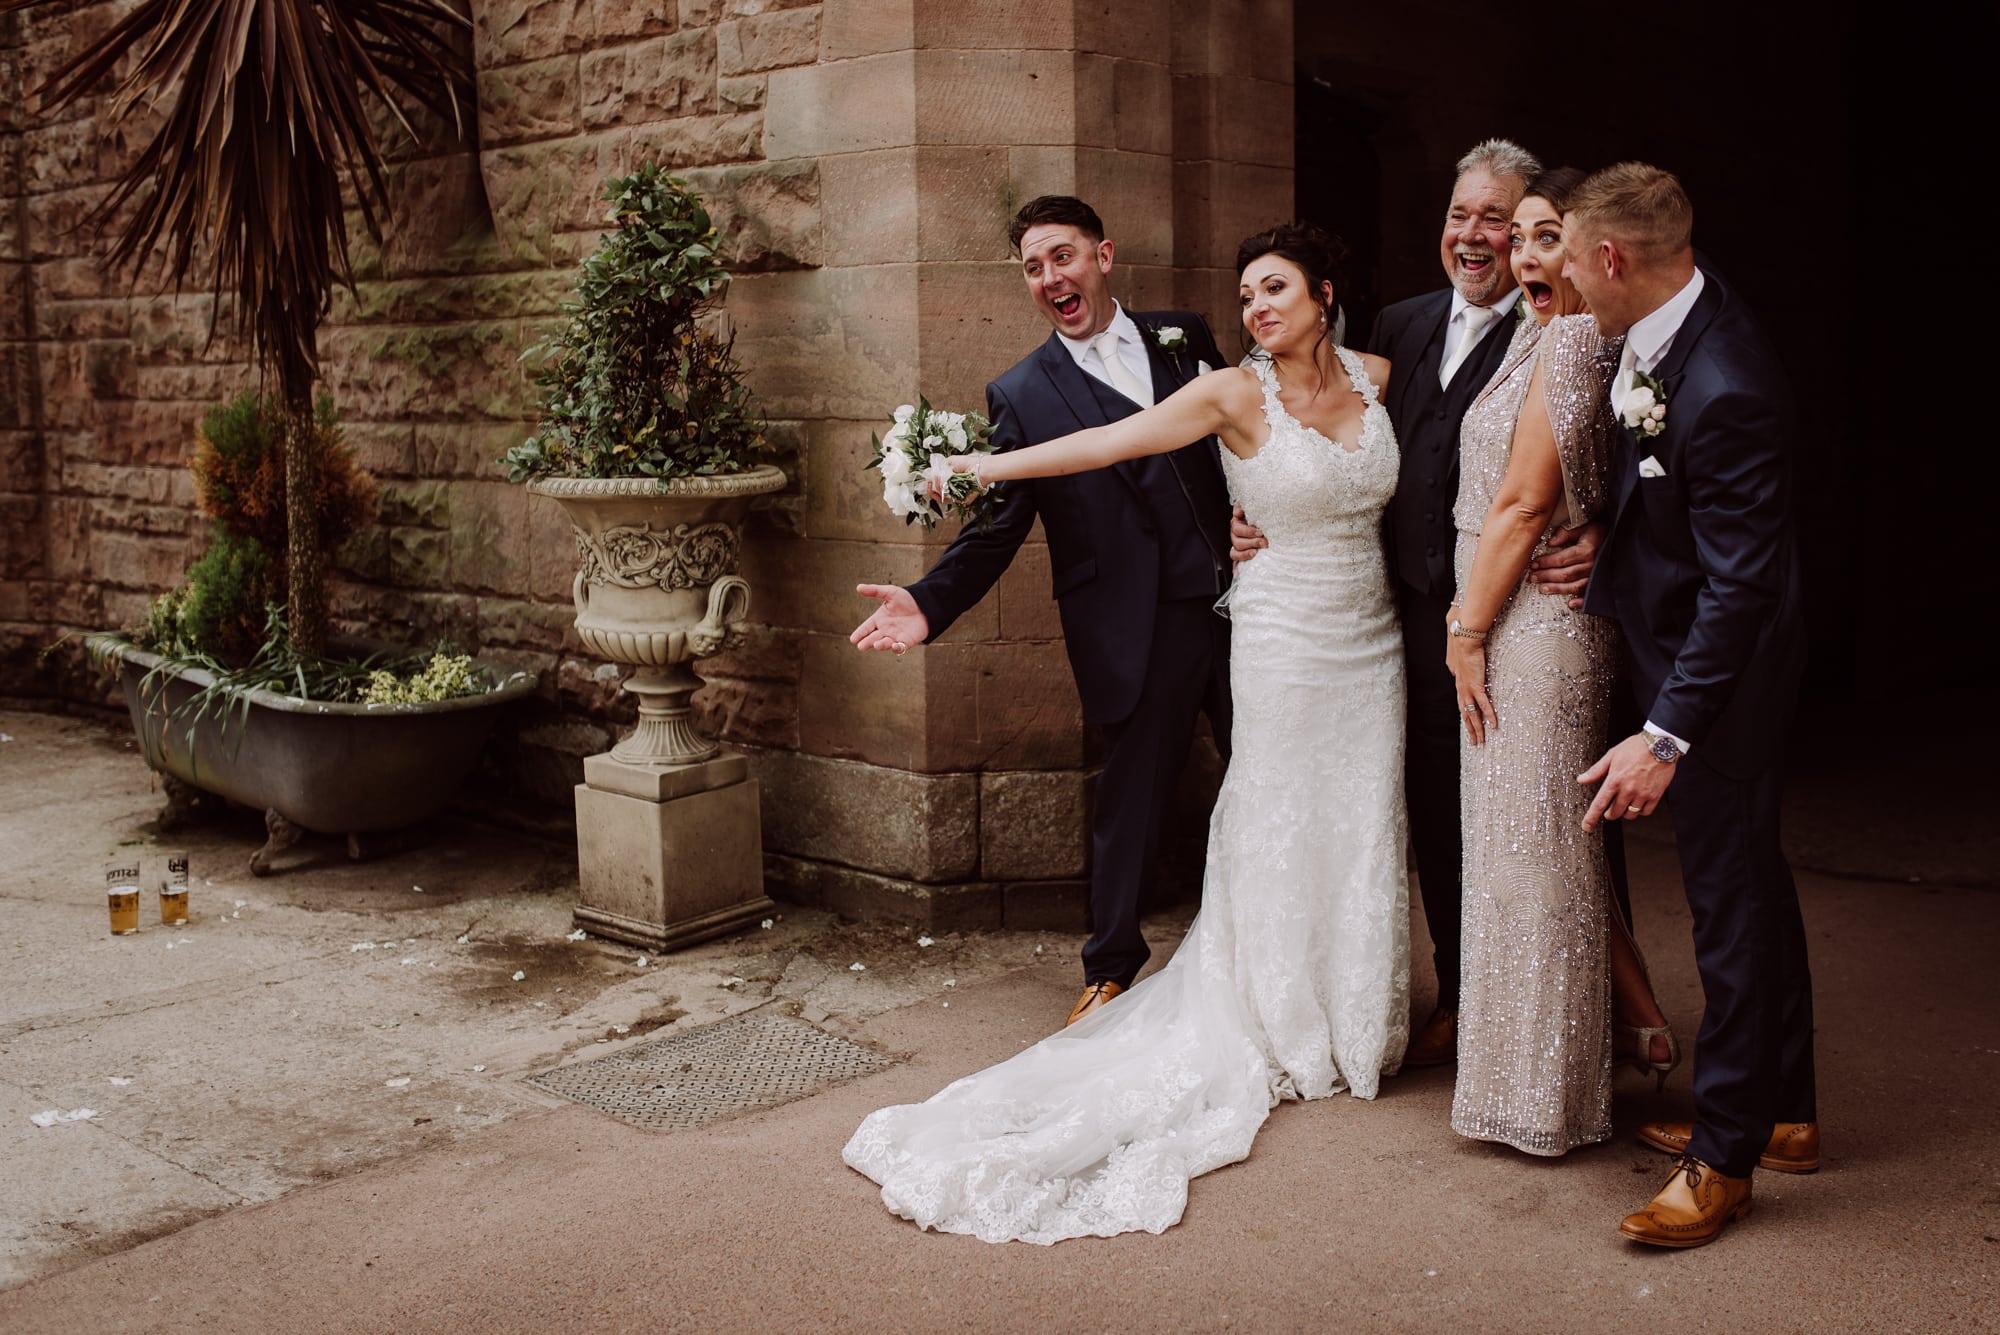 Wedding Party Portraits Tianna J-Williams Photography Peckfurton Castle